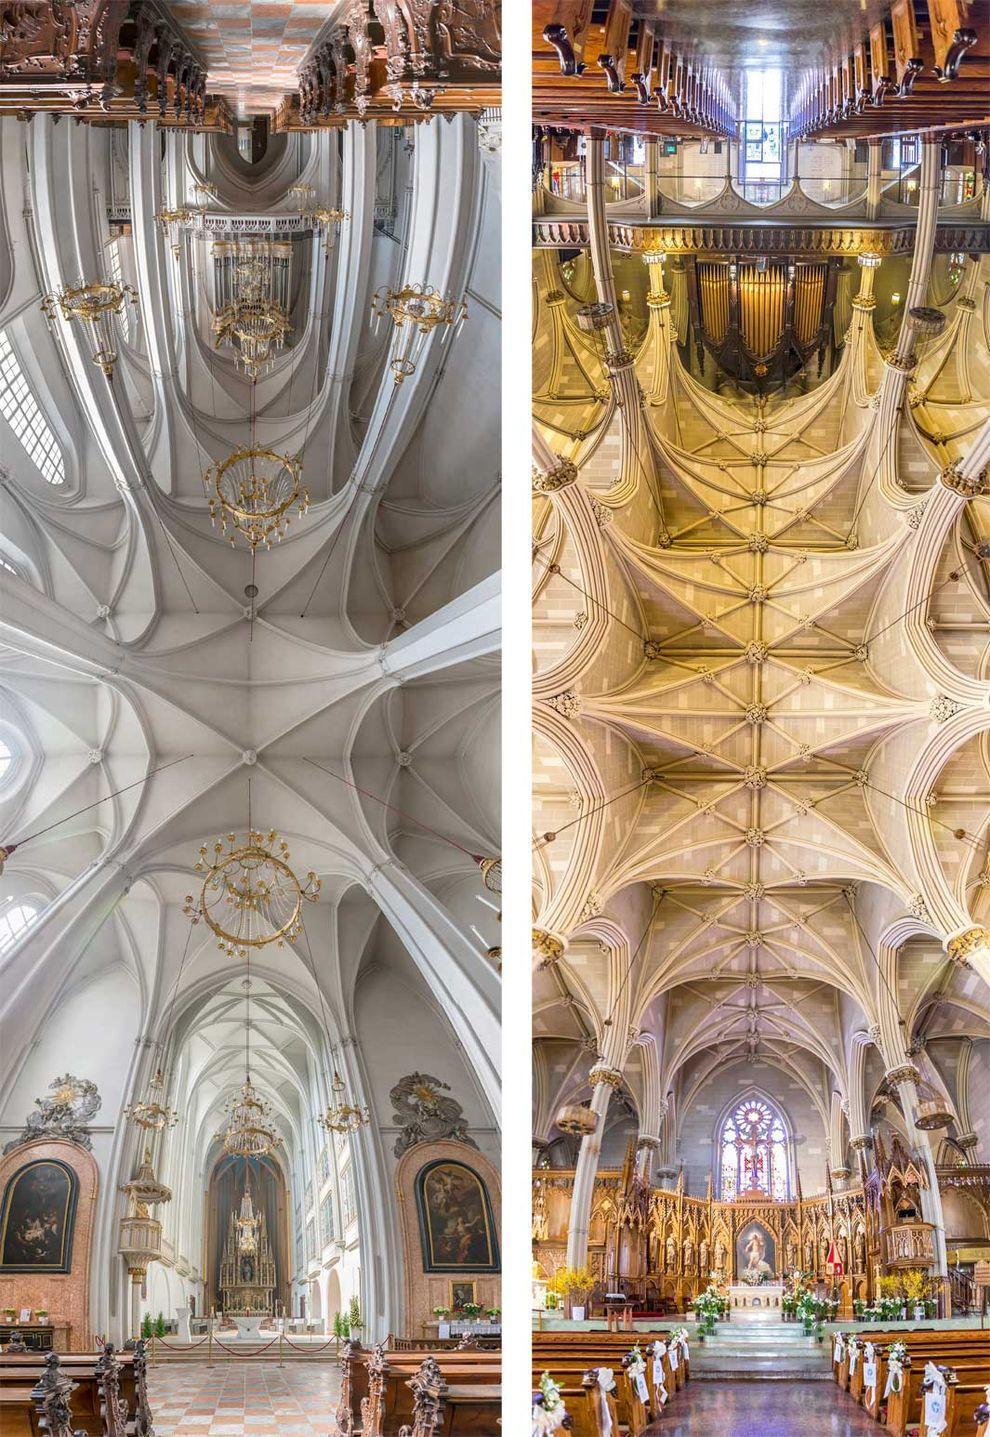 Слева: церковь Святого Августина в Вене, Австрия. Справа: базилика Святого Патрика, Нью-Йорк.